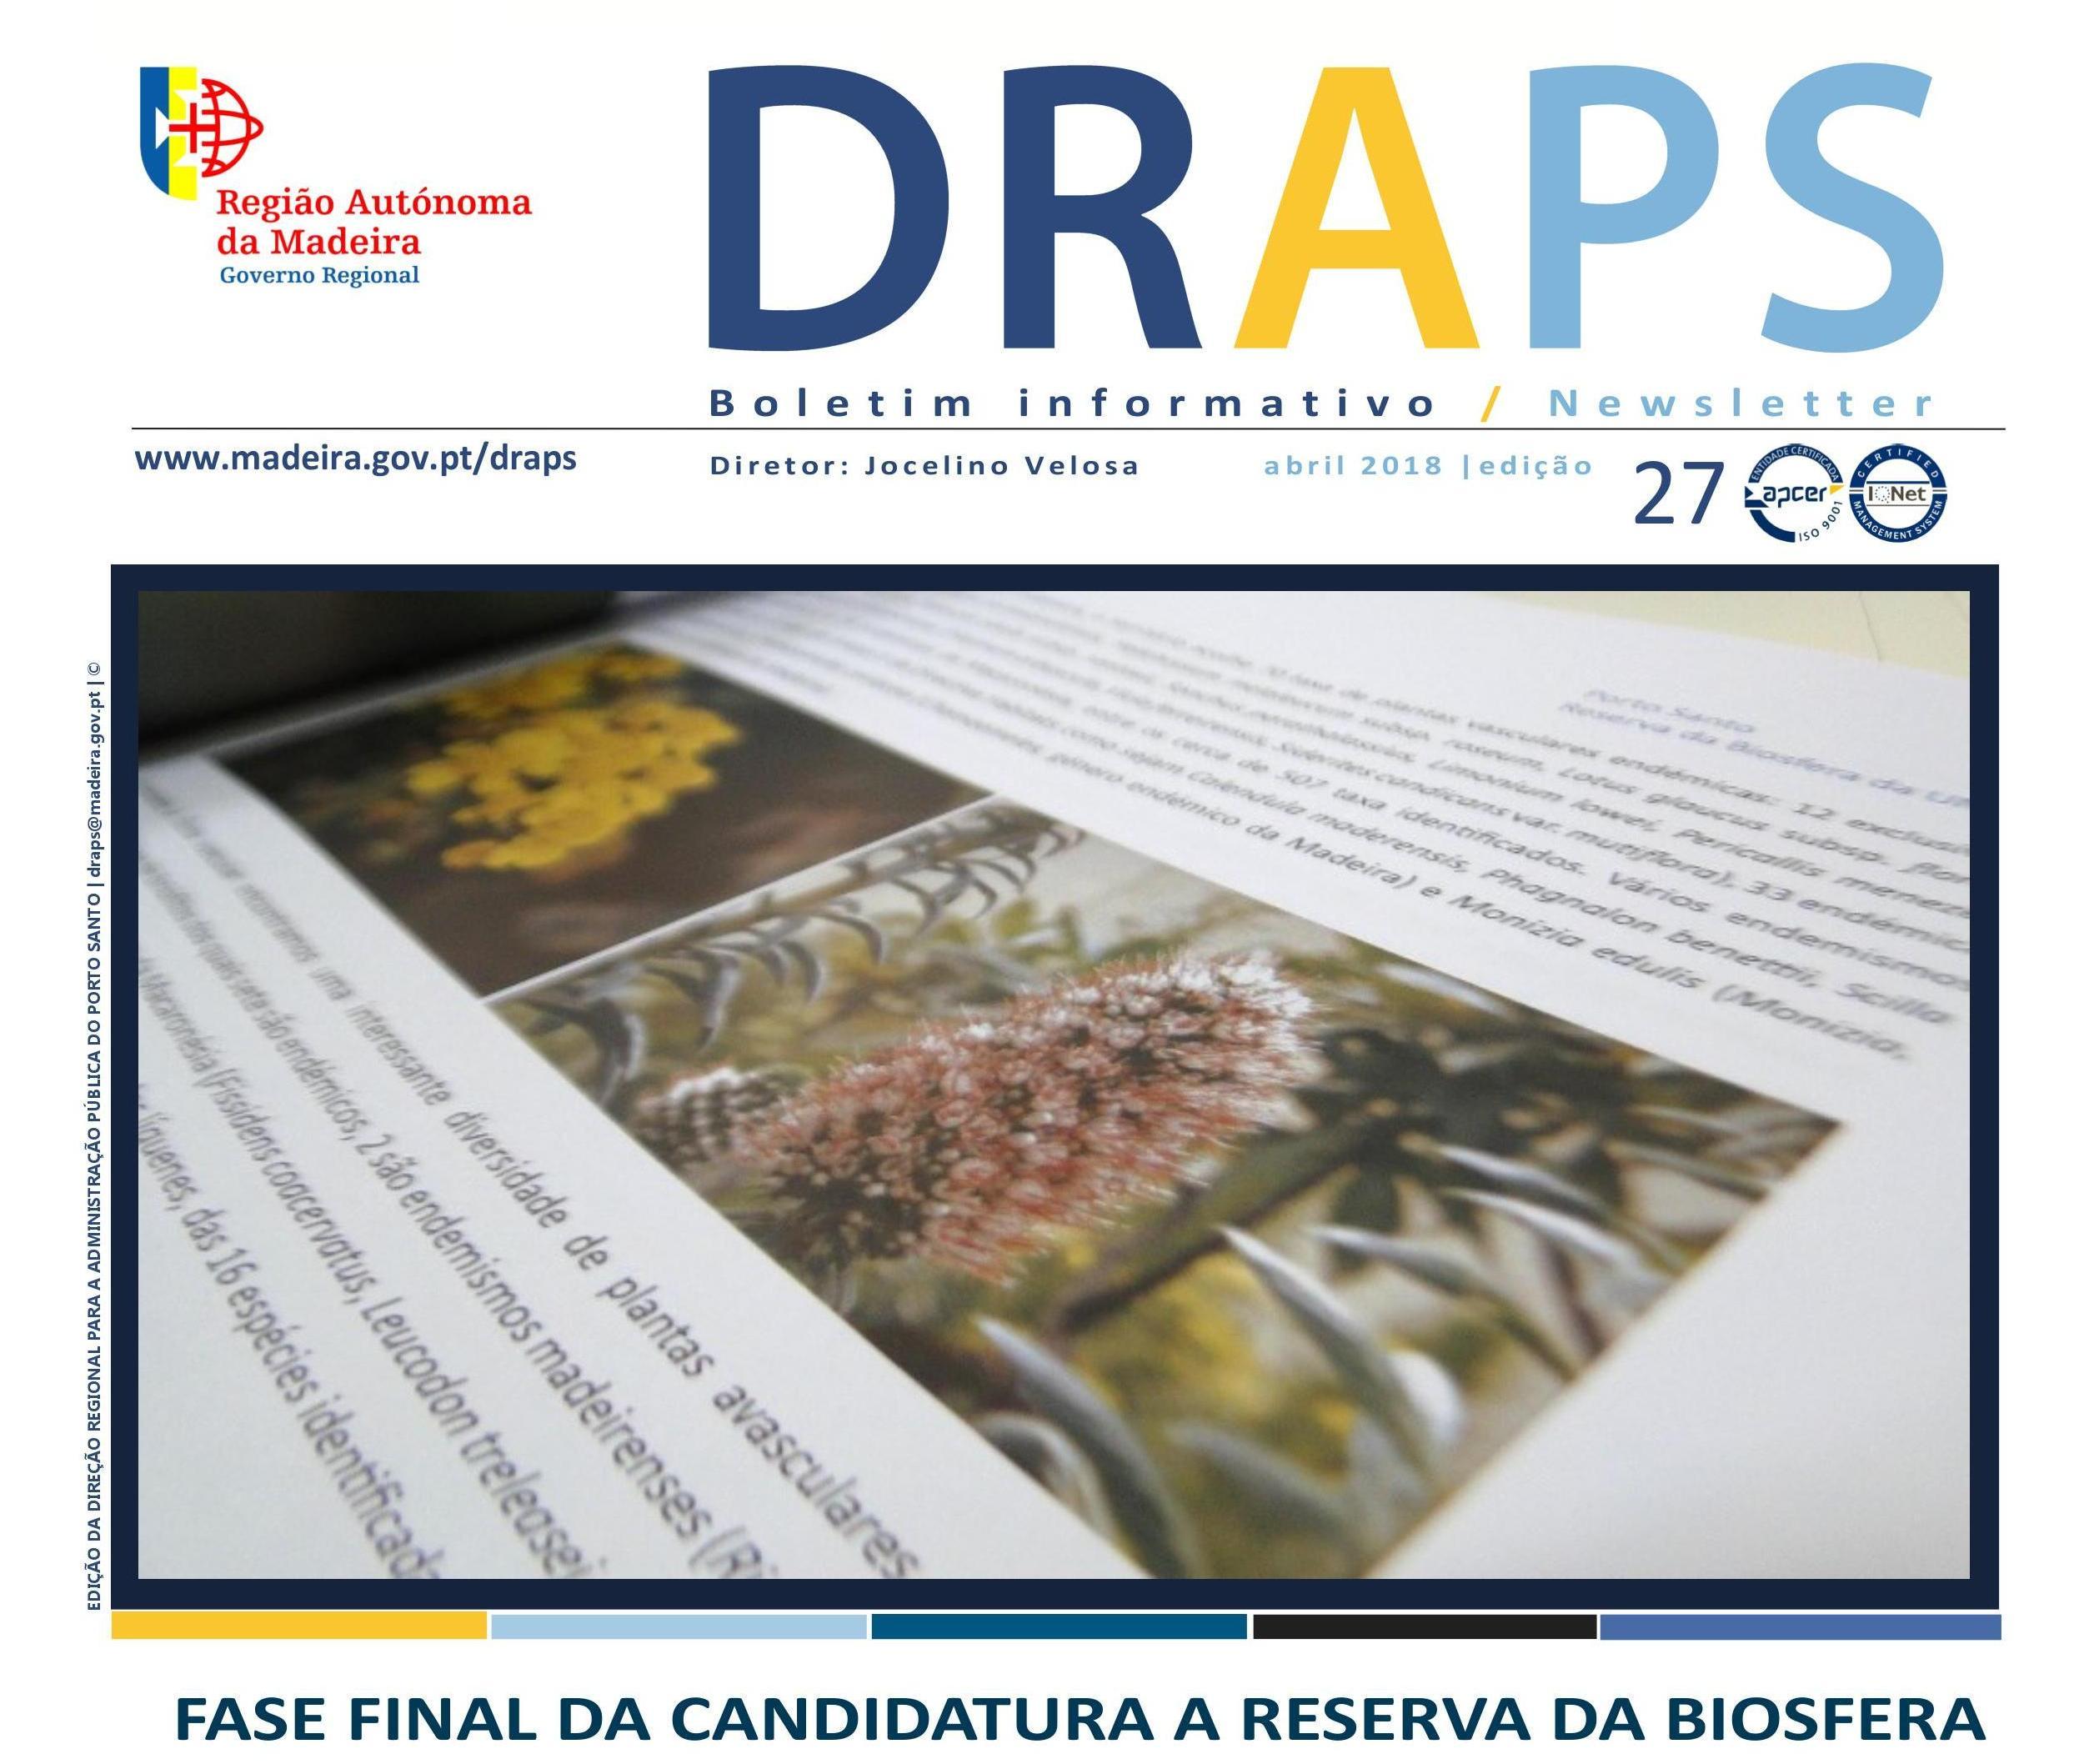 Boletim Informativo / Newsletter n.º 27